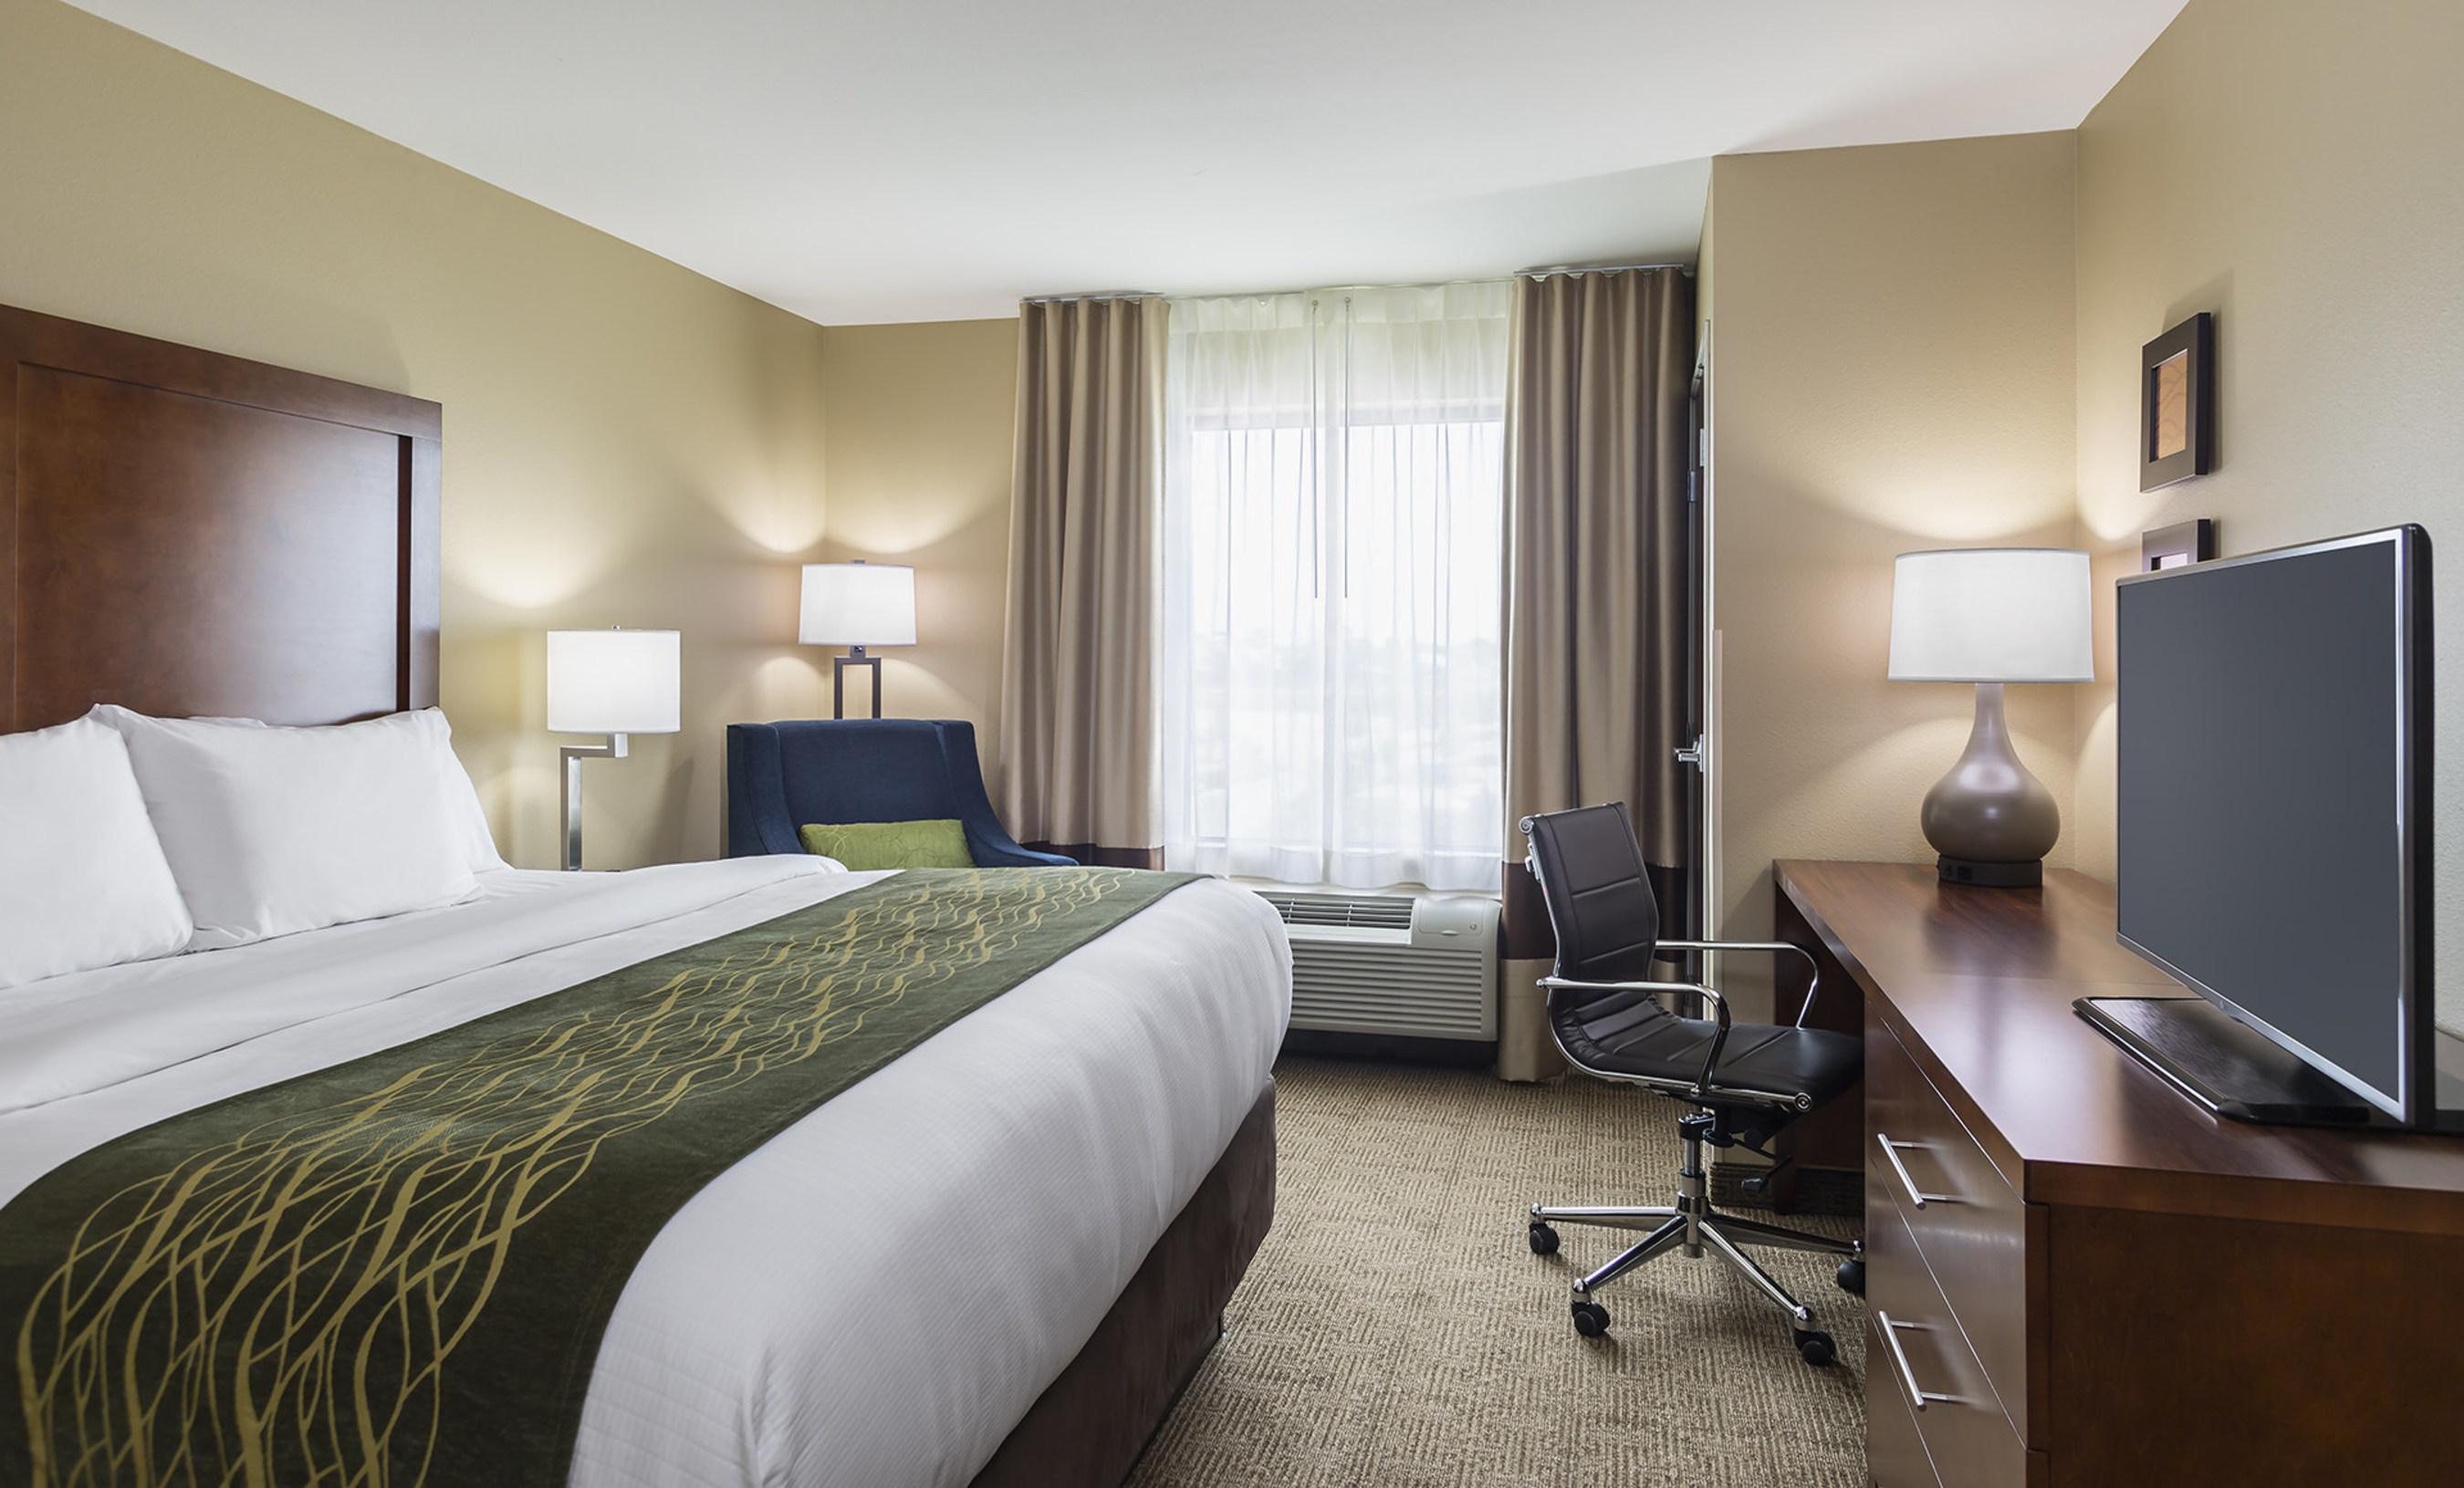 Comfort Brand Announces Extensive Hotel Renovations